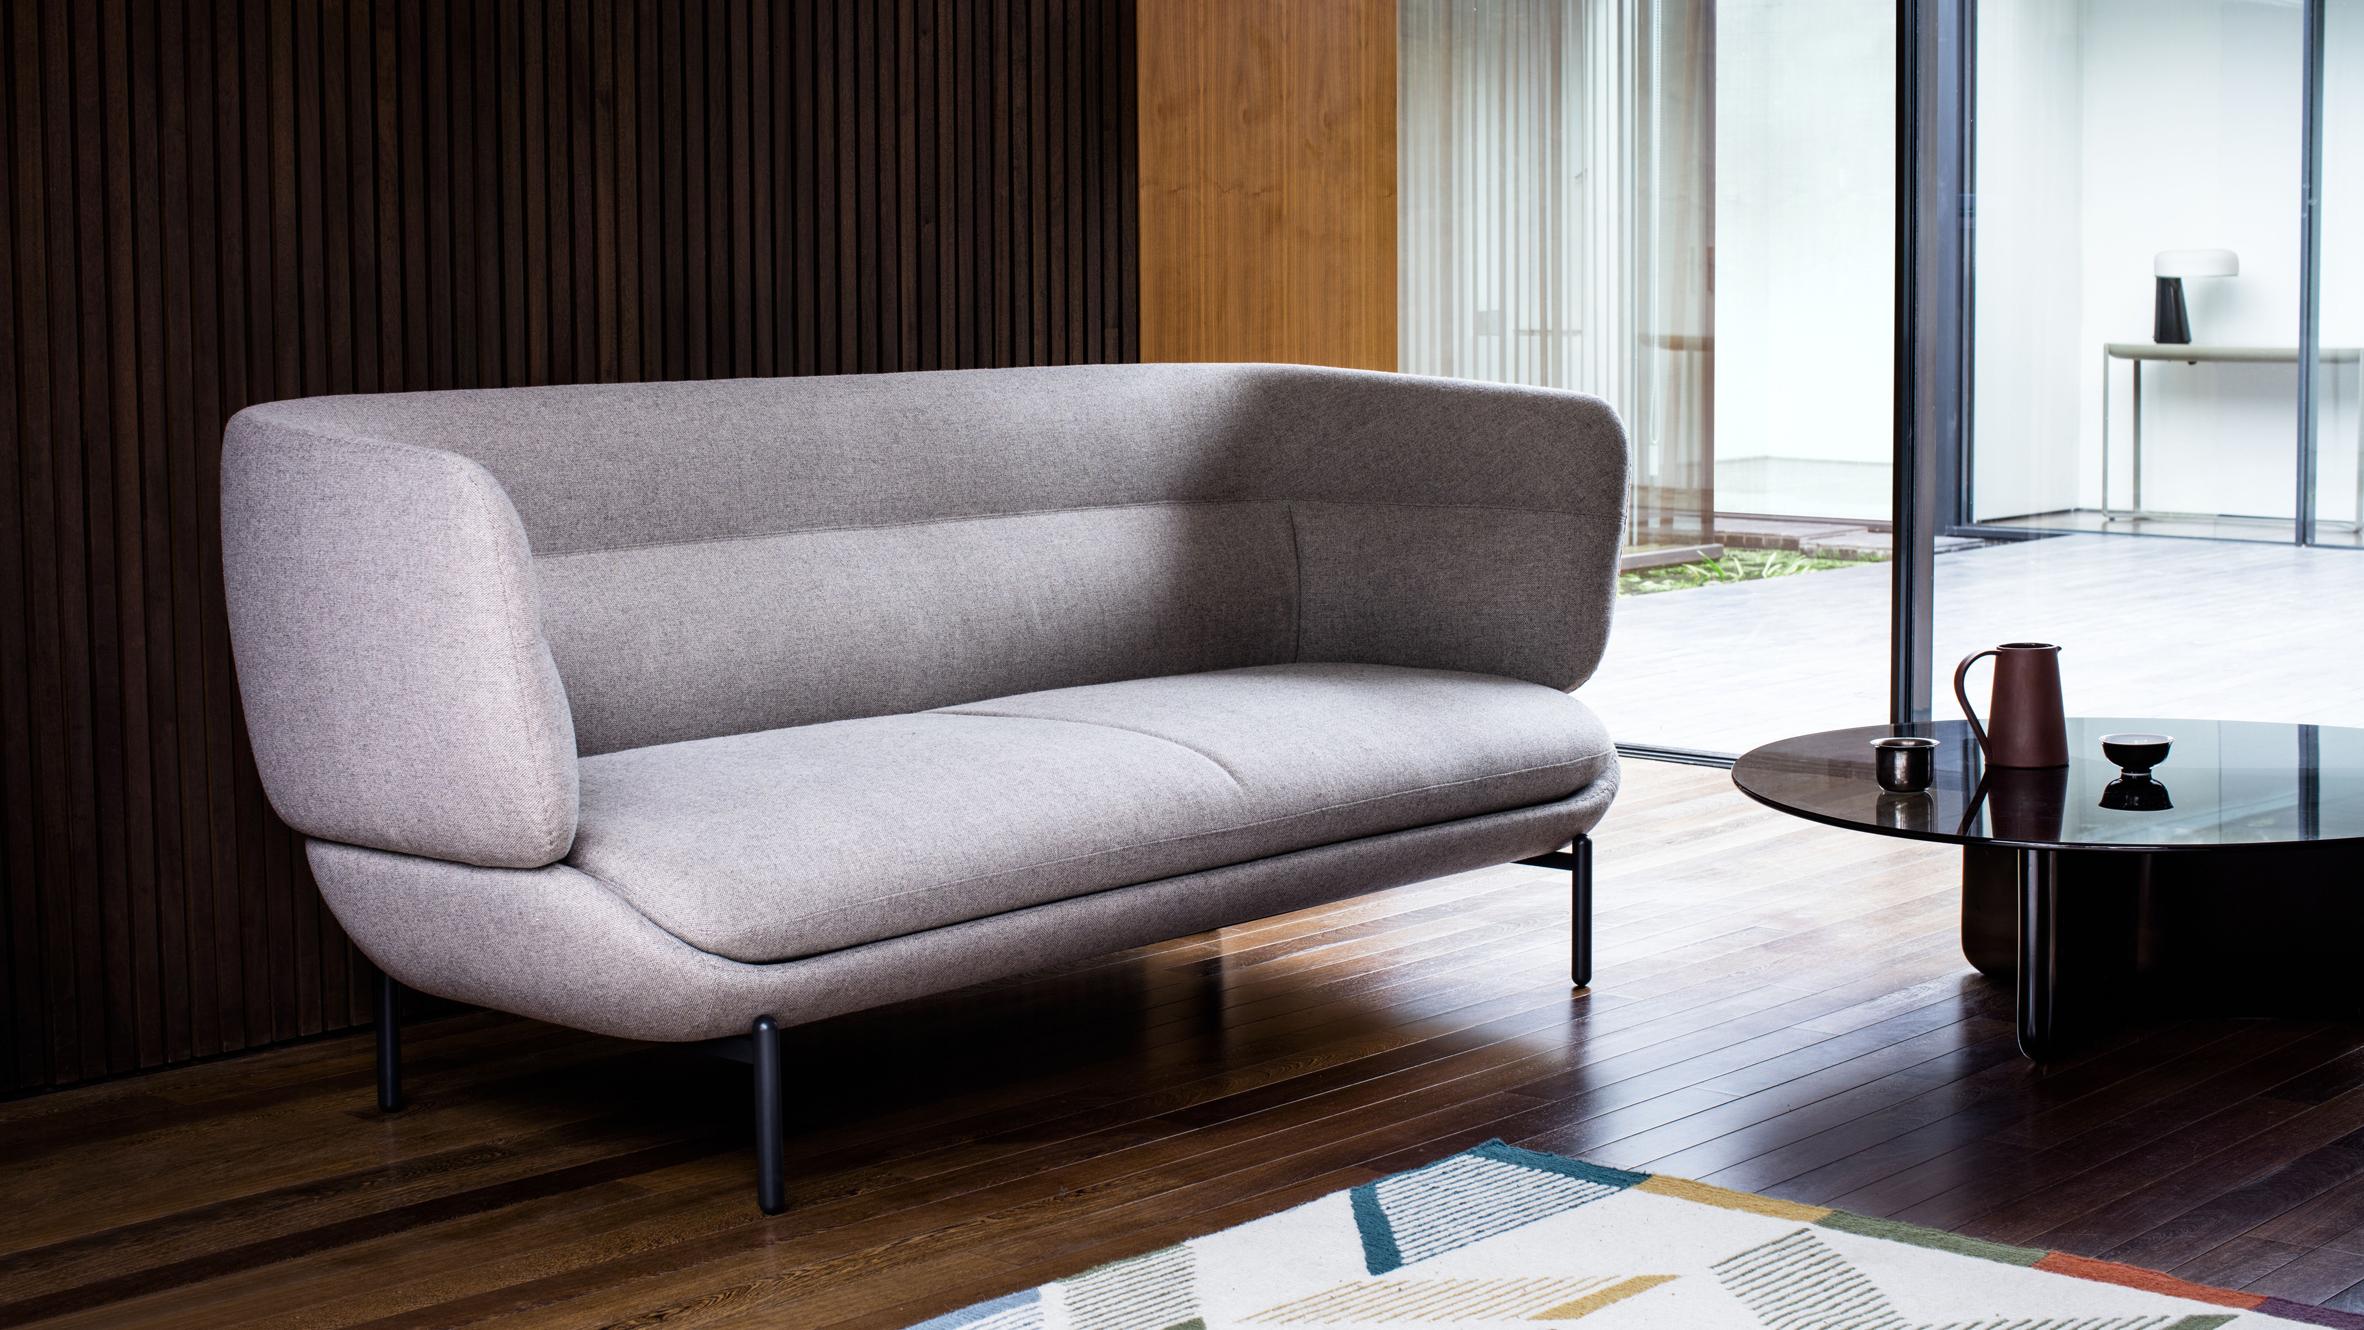 doshi-levien-furniture-collection-john-lewis-design_dezeen_hero